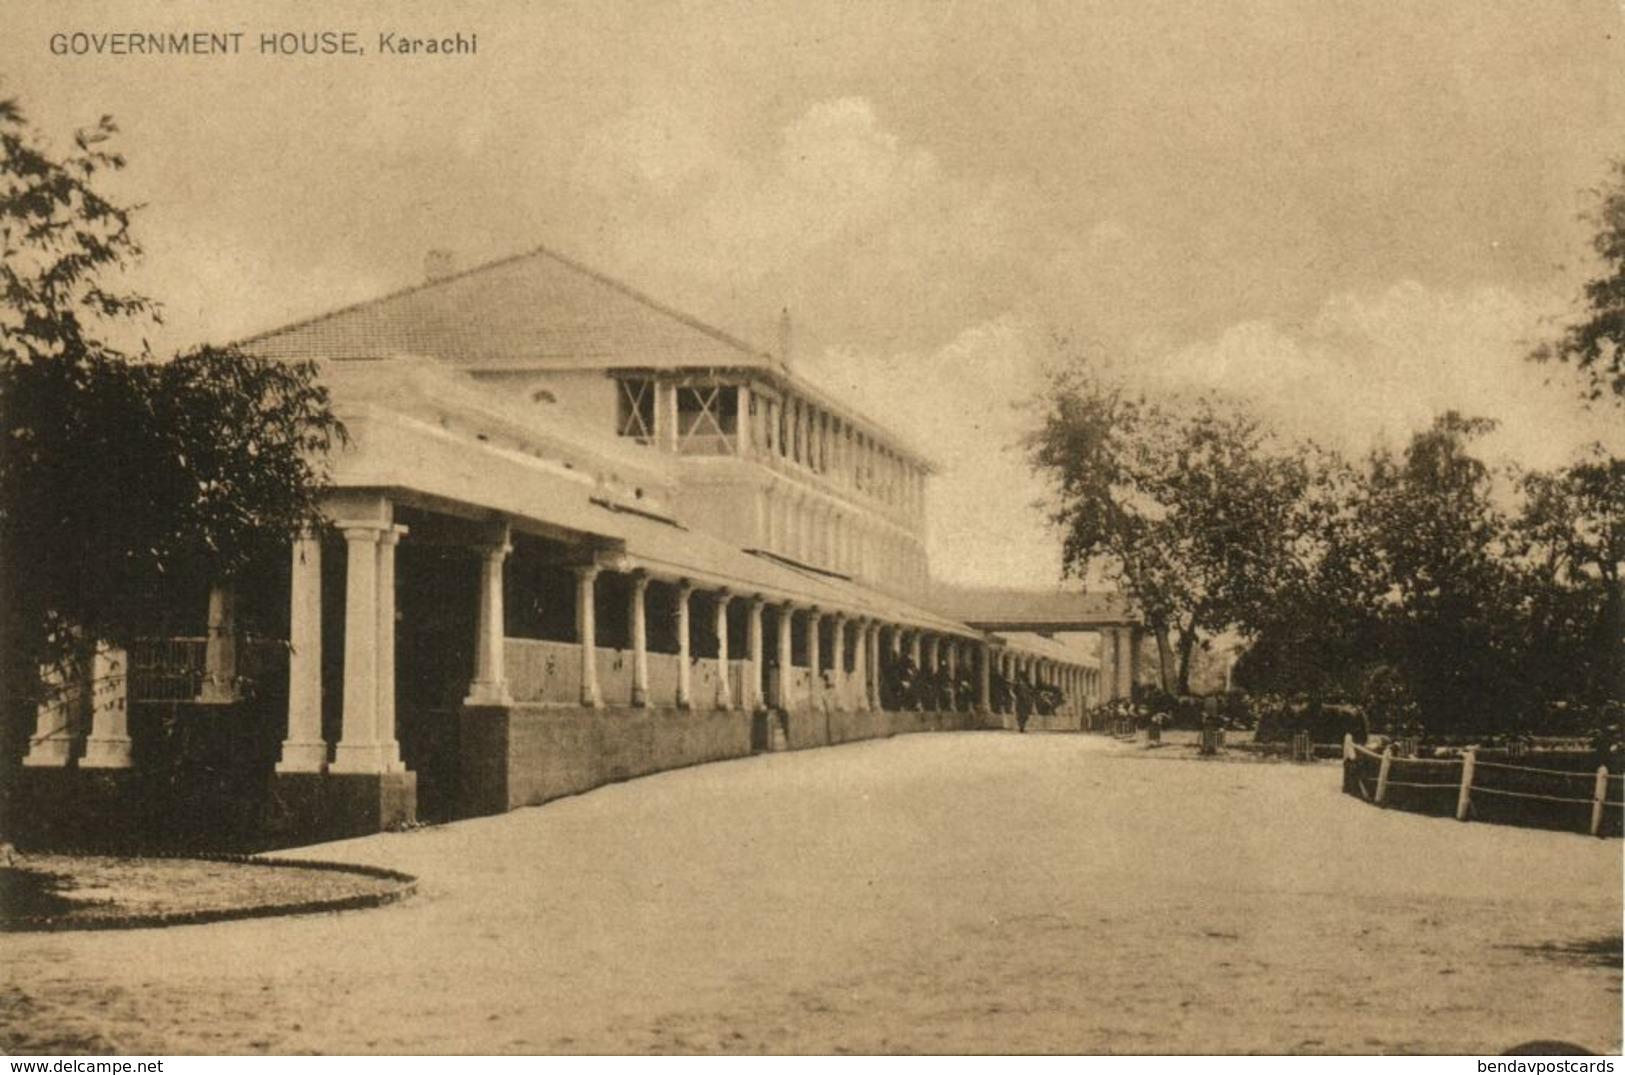 Pakistan, KARACHI, Government House (1930s) Postcard - Pakistan